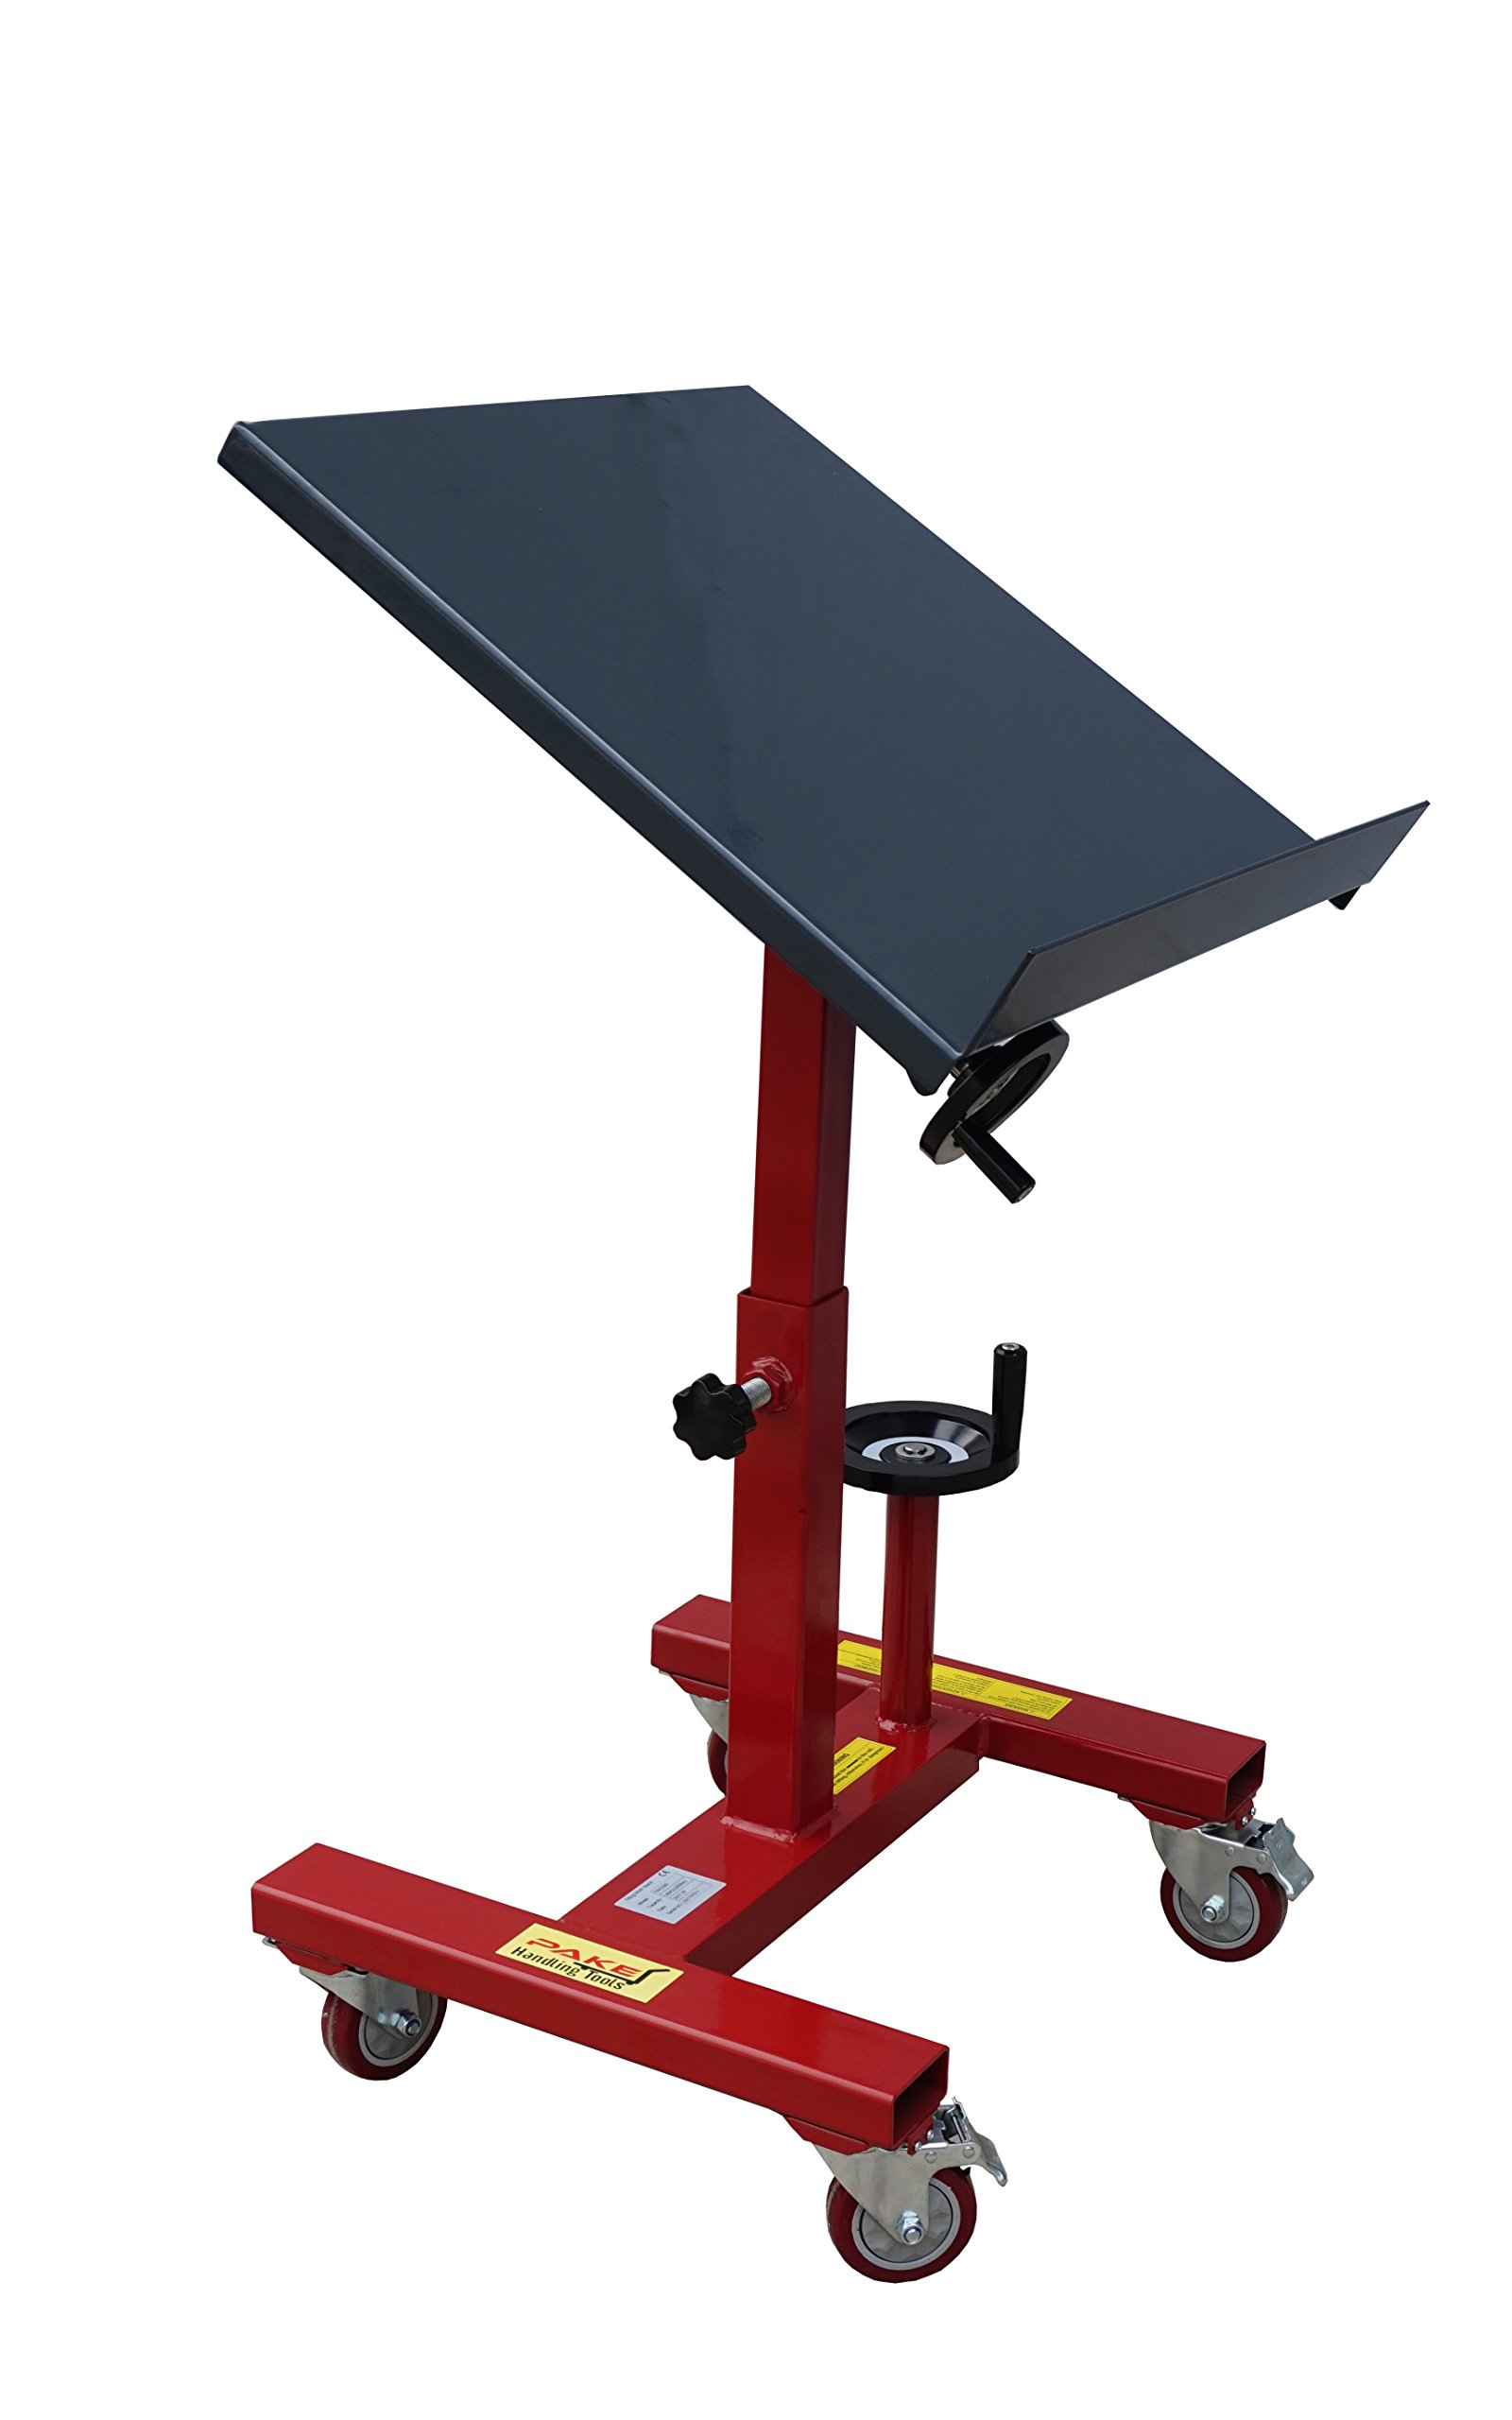 Pake Handling Tools - Tilting Work Table, 300 lbs Capacity, 24x24'', 31.5 to 42'' Height, 30 Degree Tilting by Pake Handling Tools (Image #1)